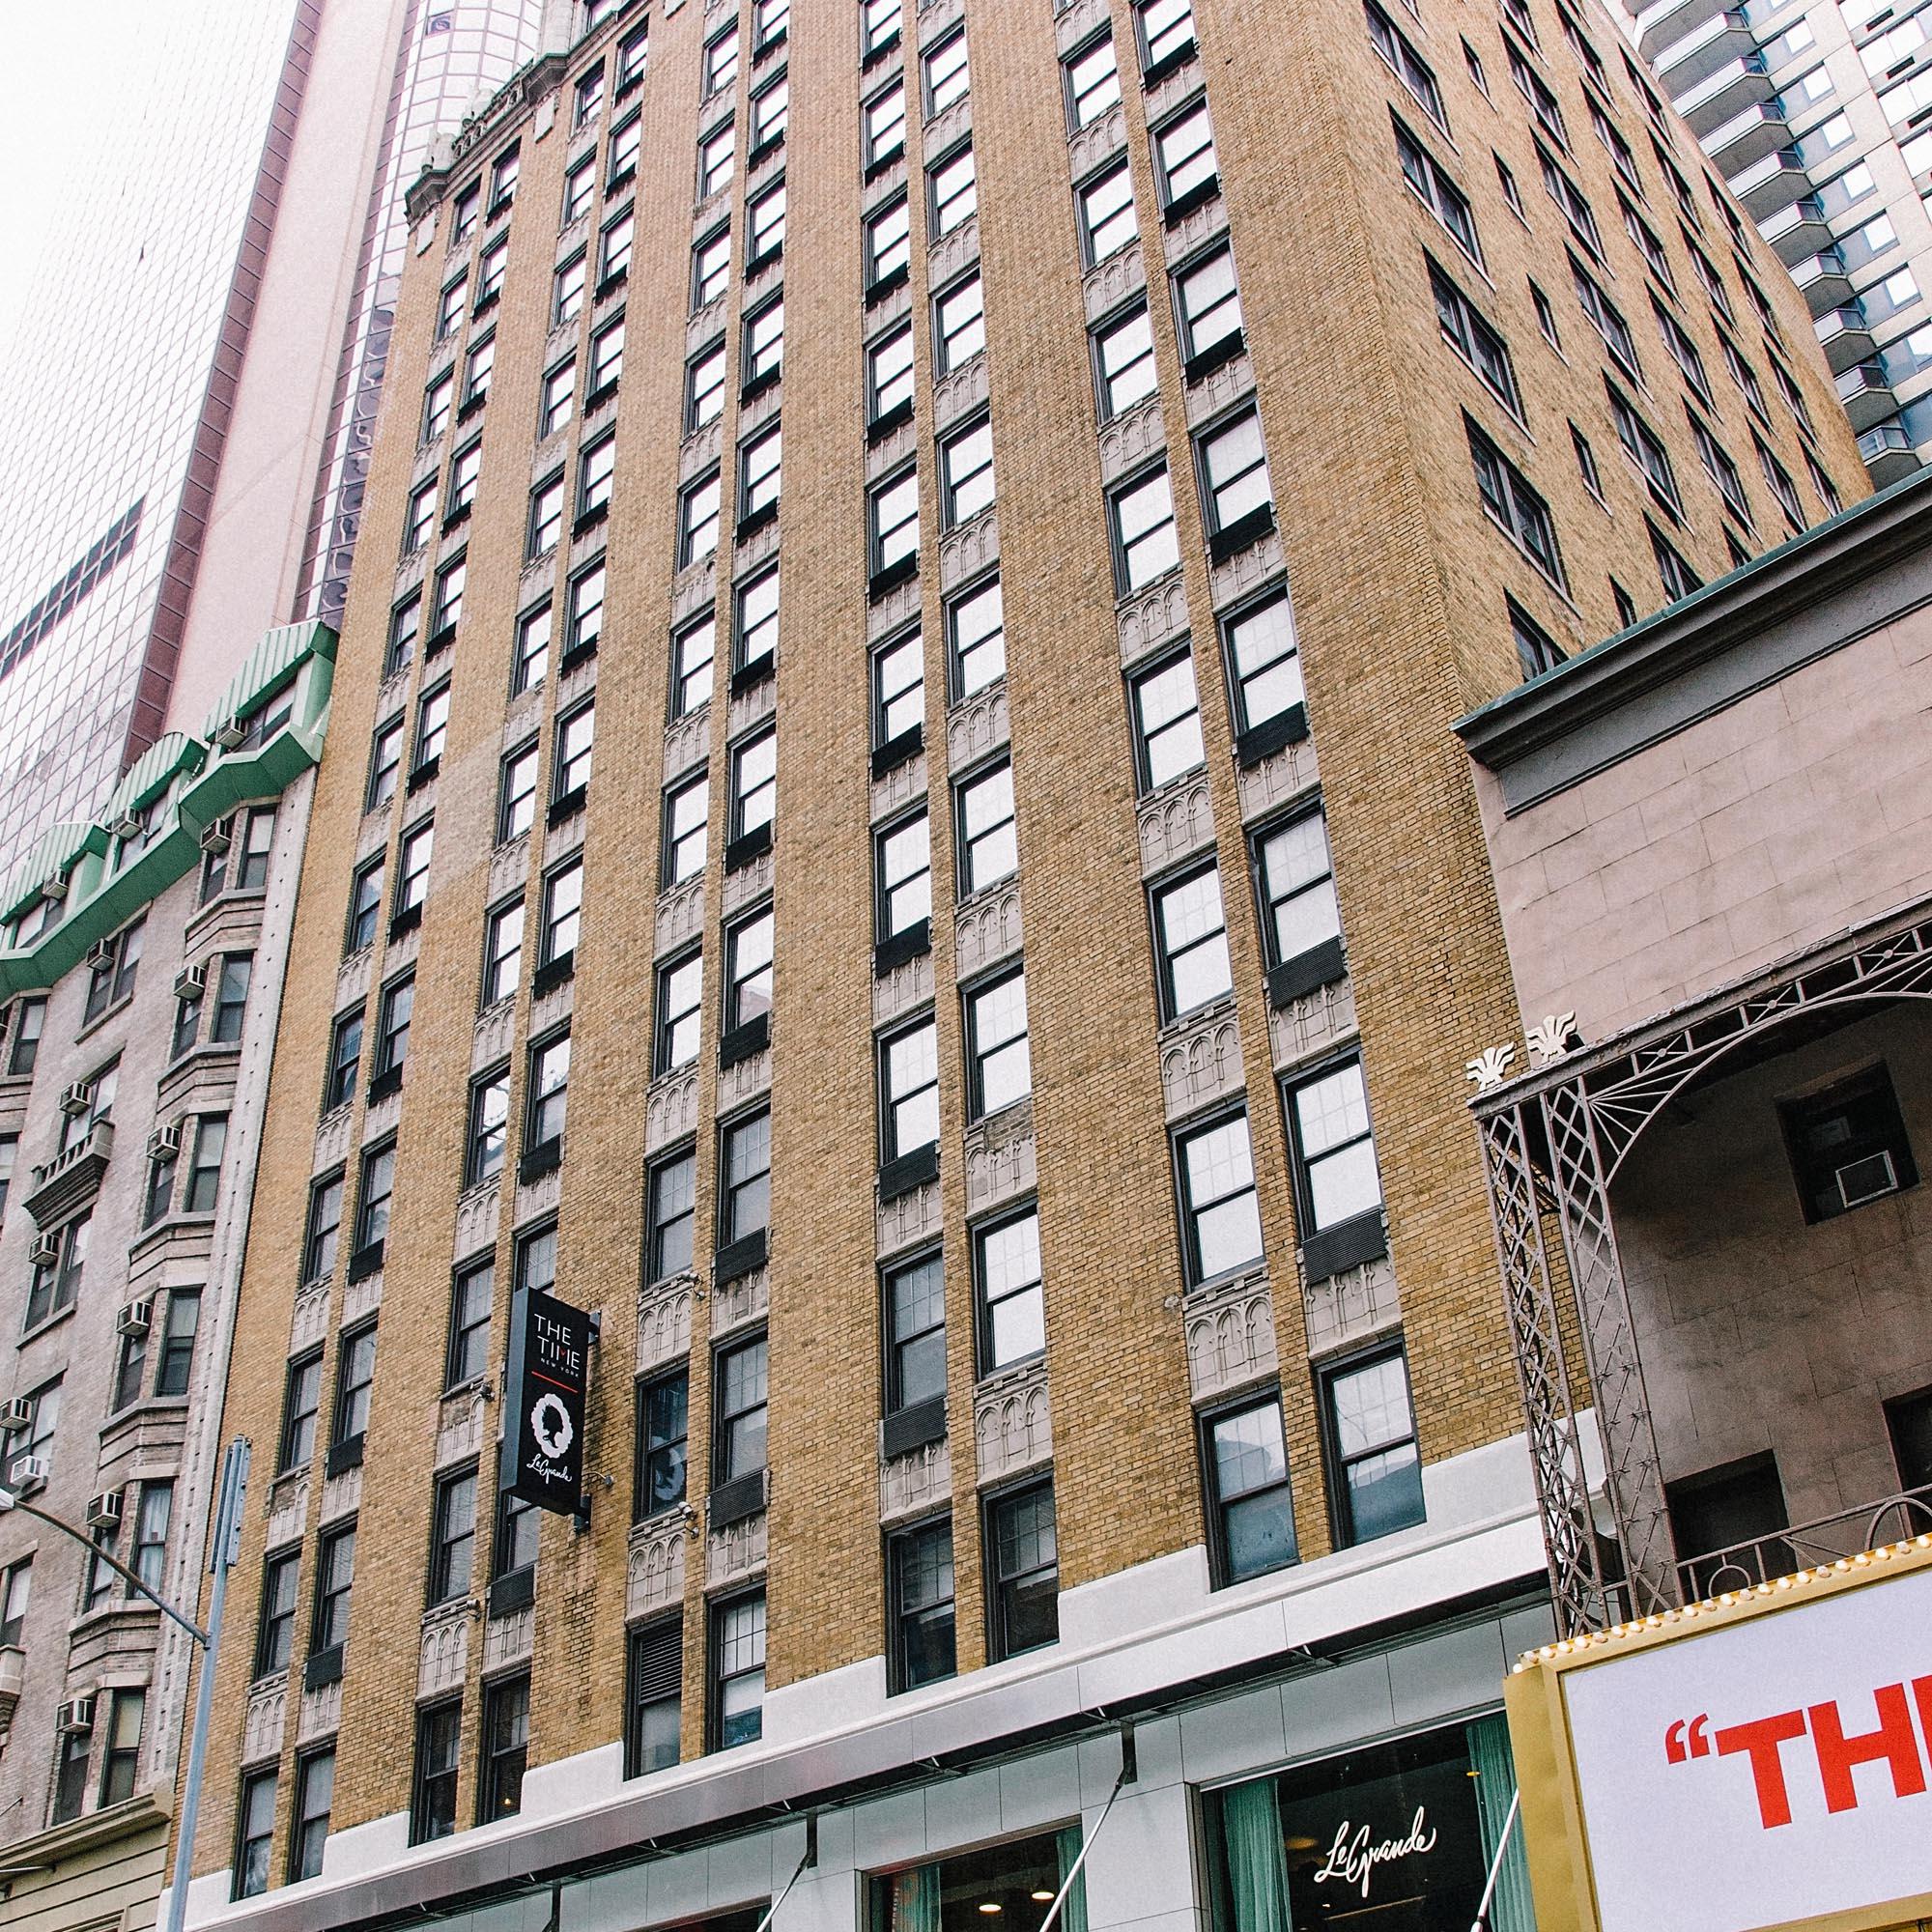 nyc-photographers-REAL-ESTATE-PHOTOSHOOT-10012.jpg